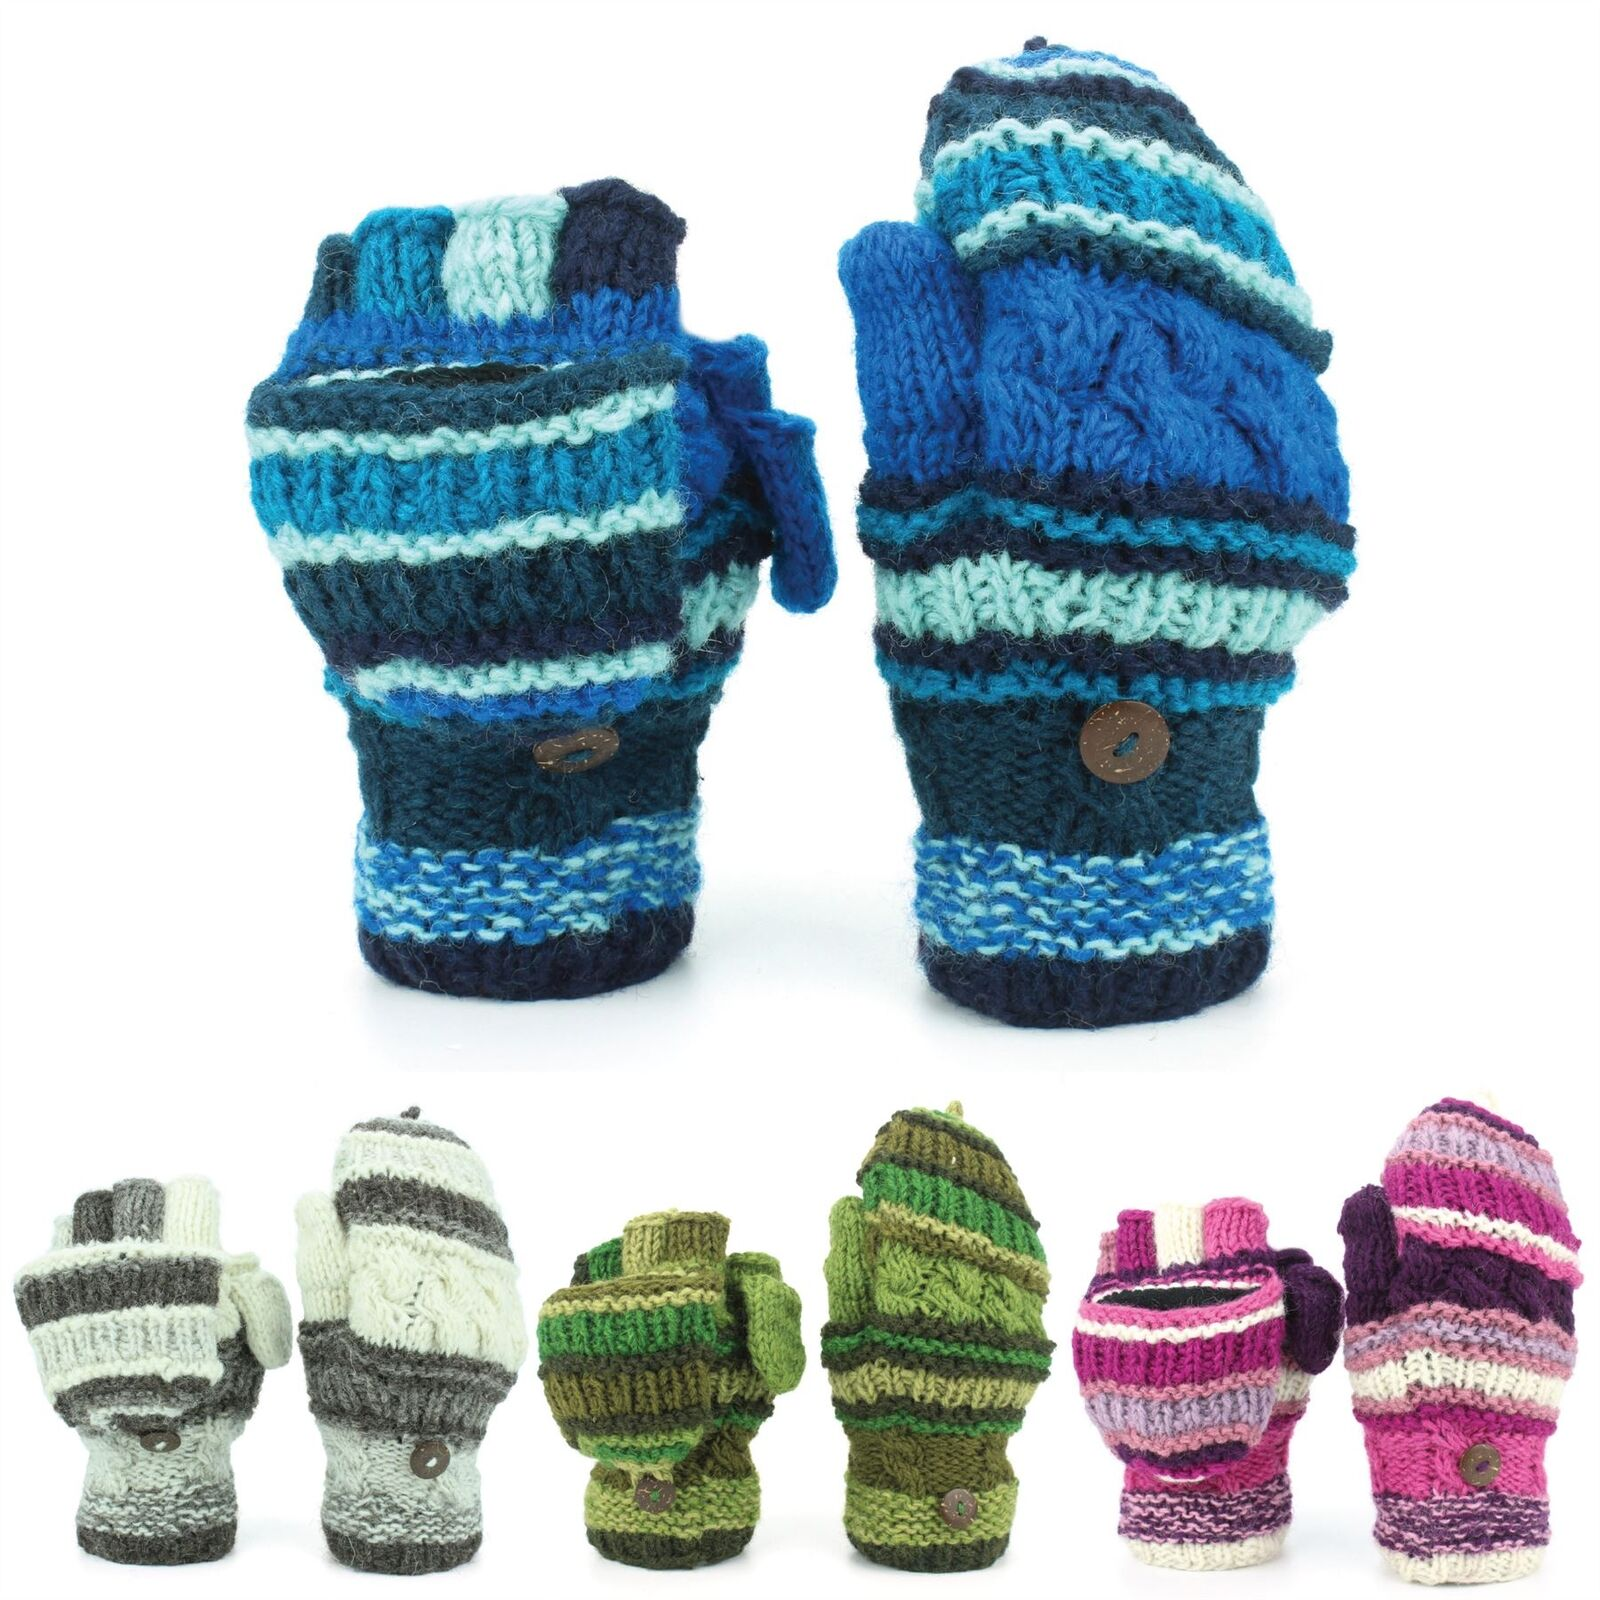 Wool Gloves Shooters Mittens Fleece Lined STRIPE MIXED KNITS Nepal Handmade